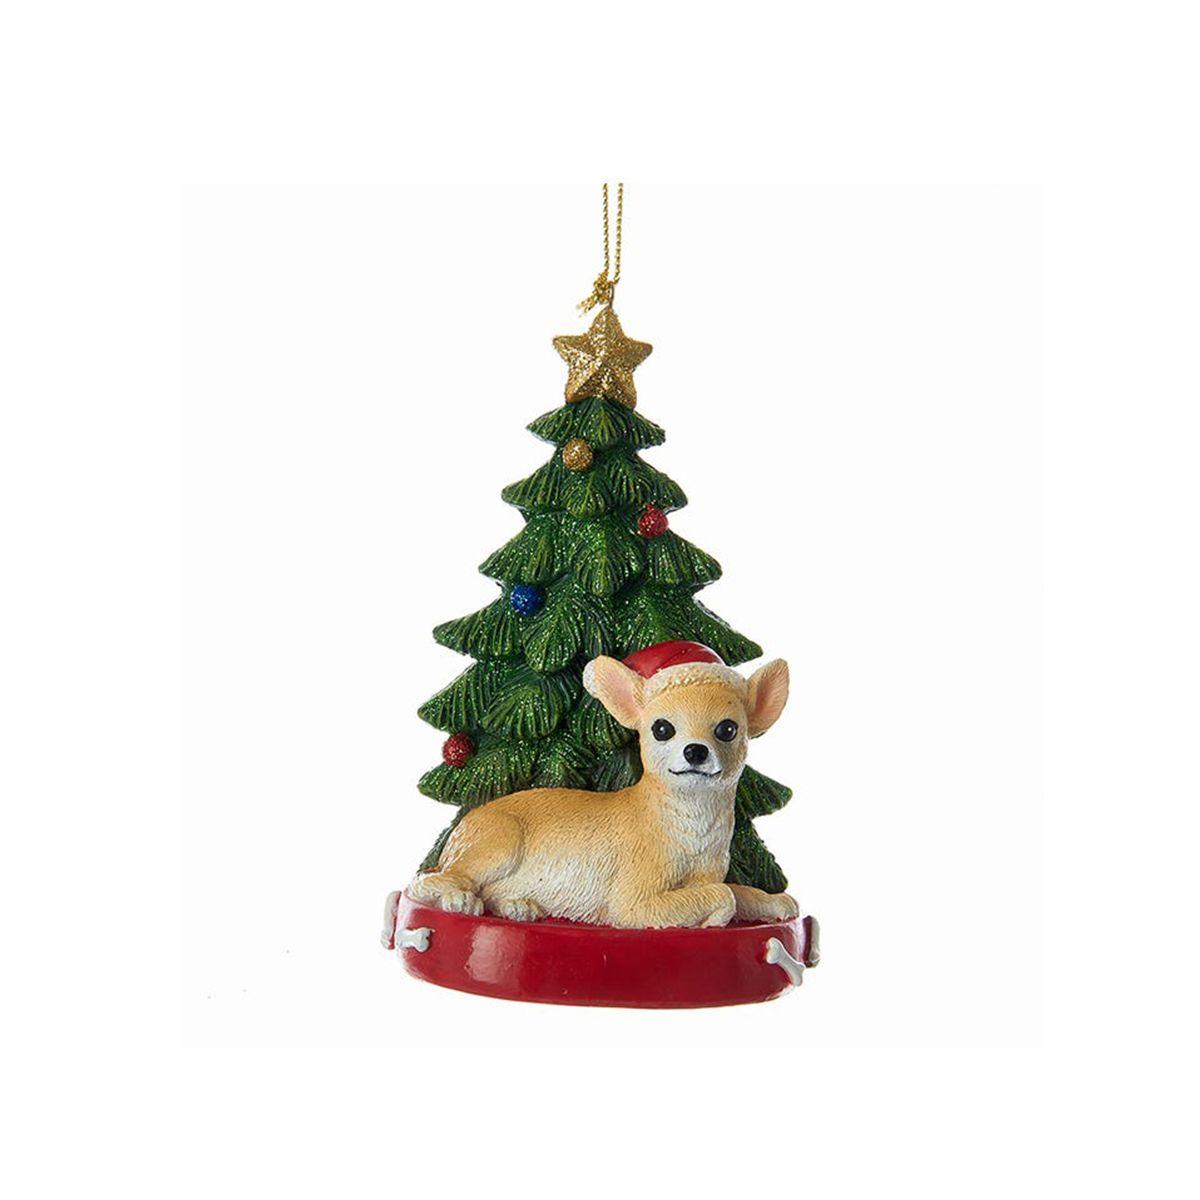 Kurt Adler Chihuahua With Christmas Tree Ornament For Personalization Christmas Tree Ornaments Christmas Ornaments Tree Ornaments